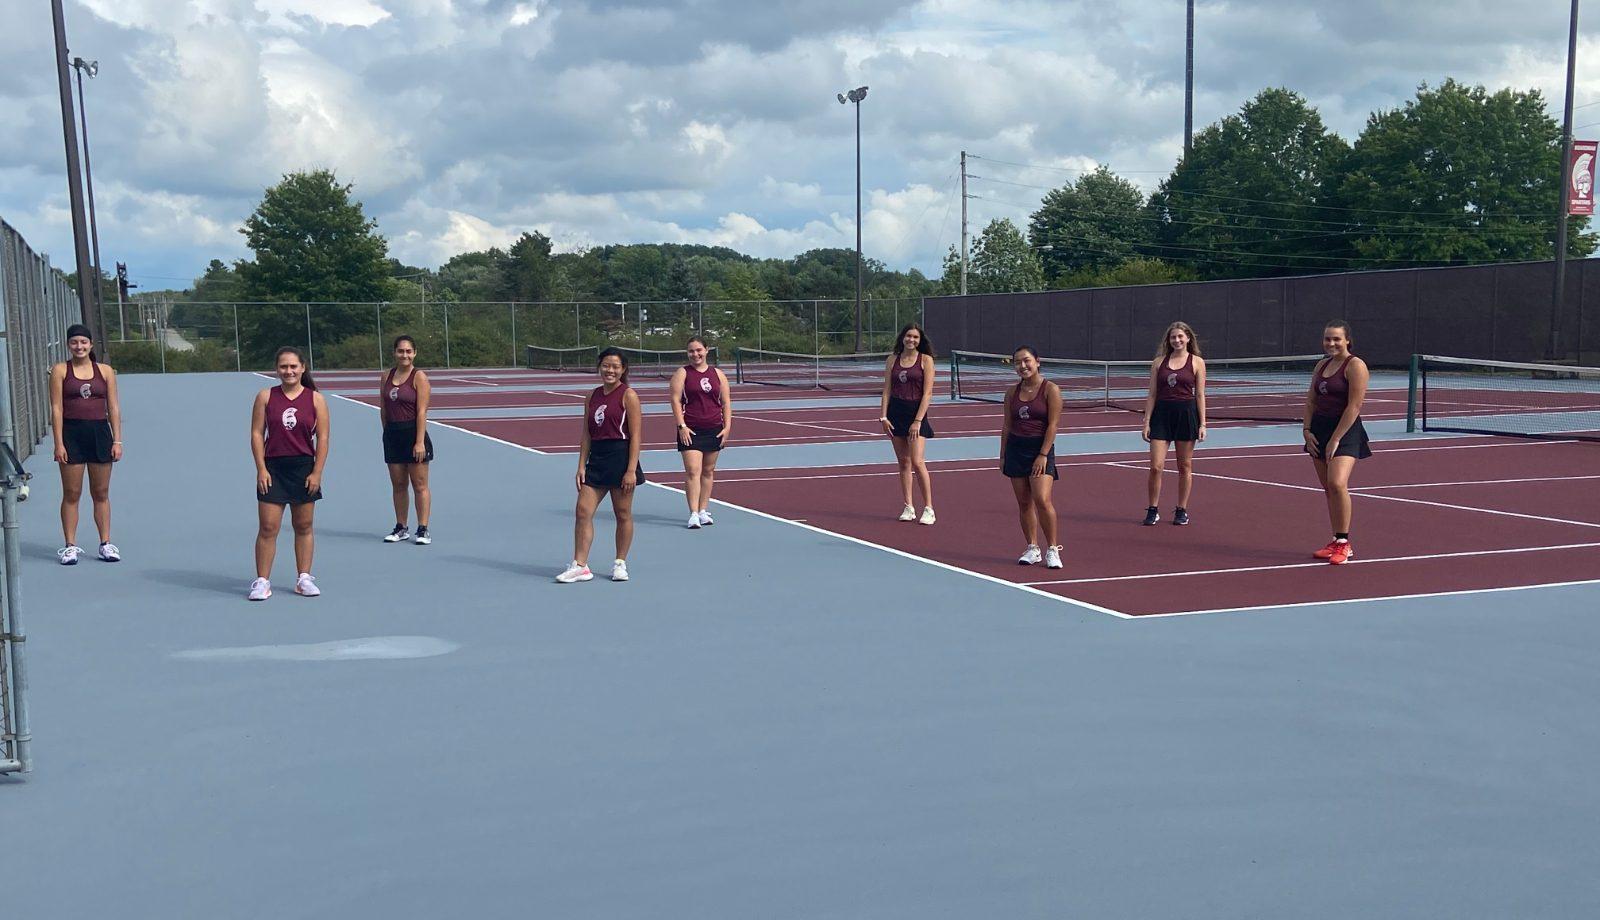 Refurbished Tennis Courts